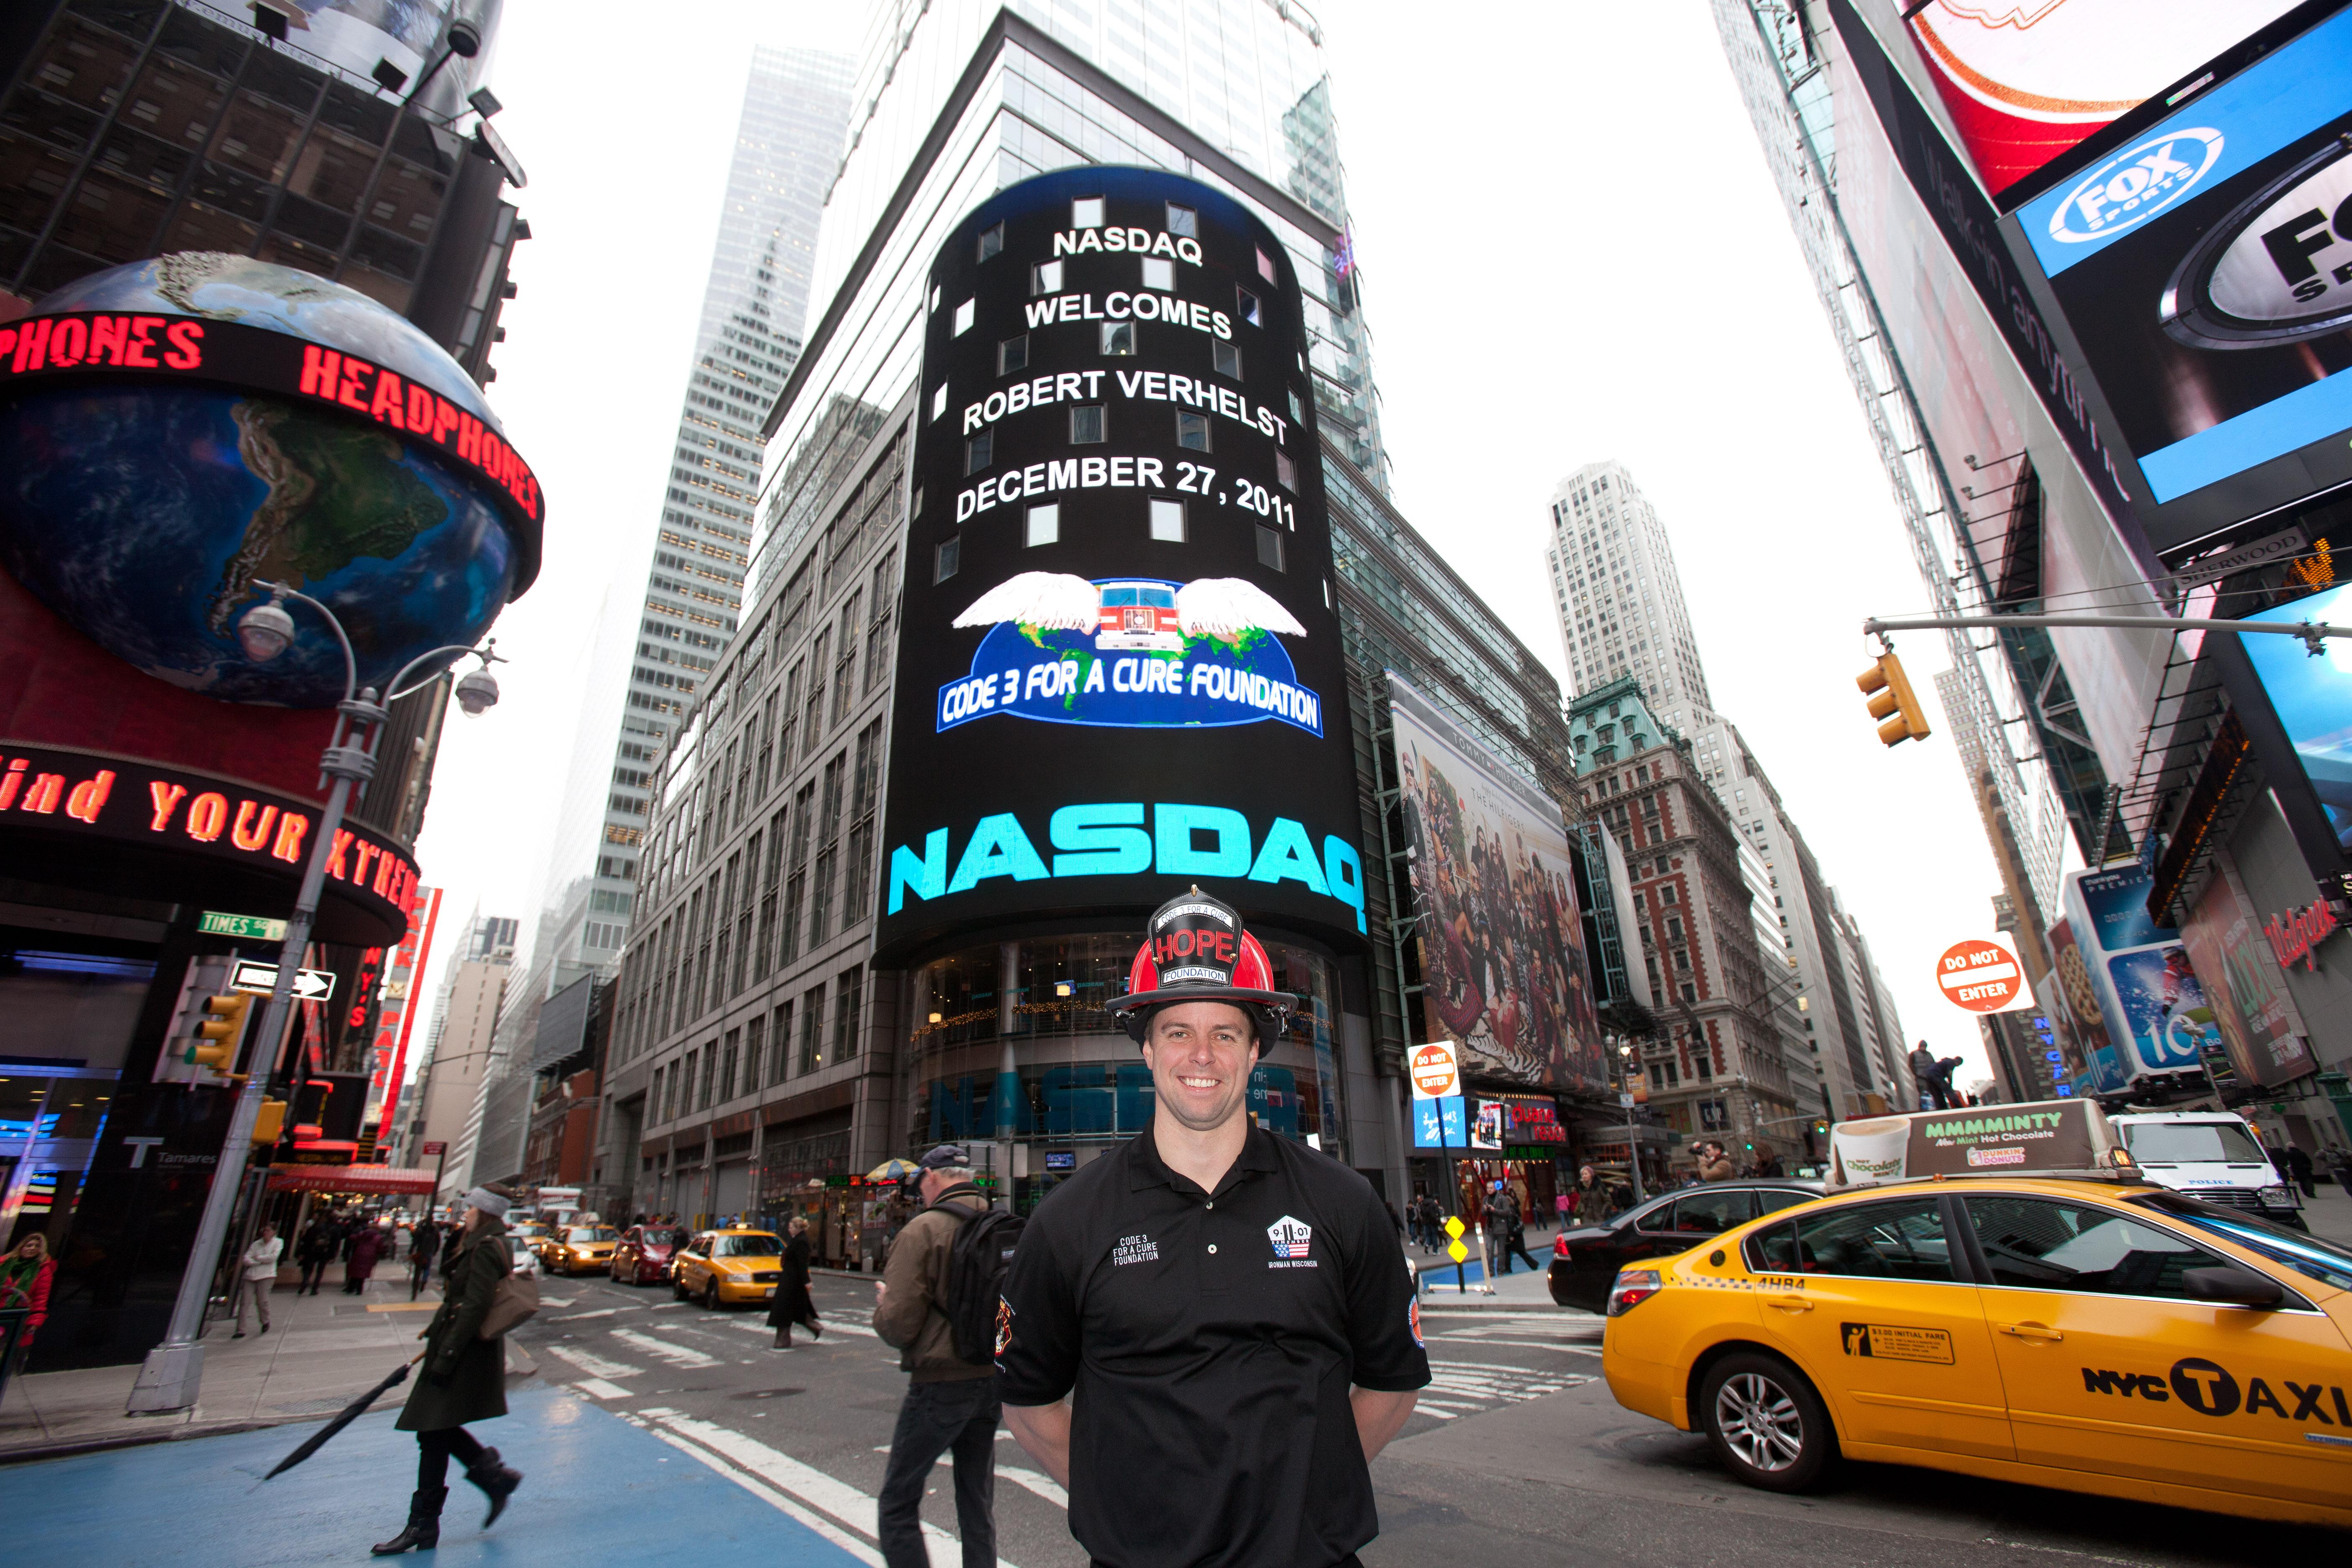 Ringing opening bell at NASDAQ